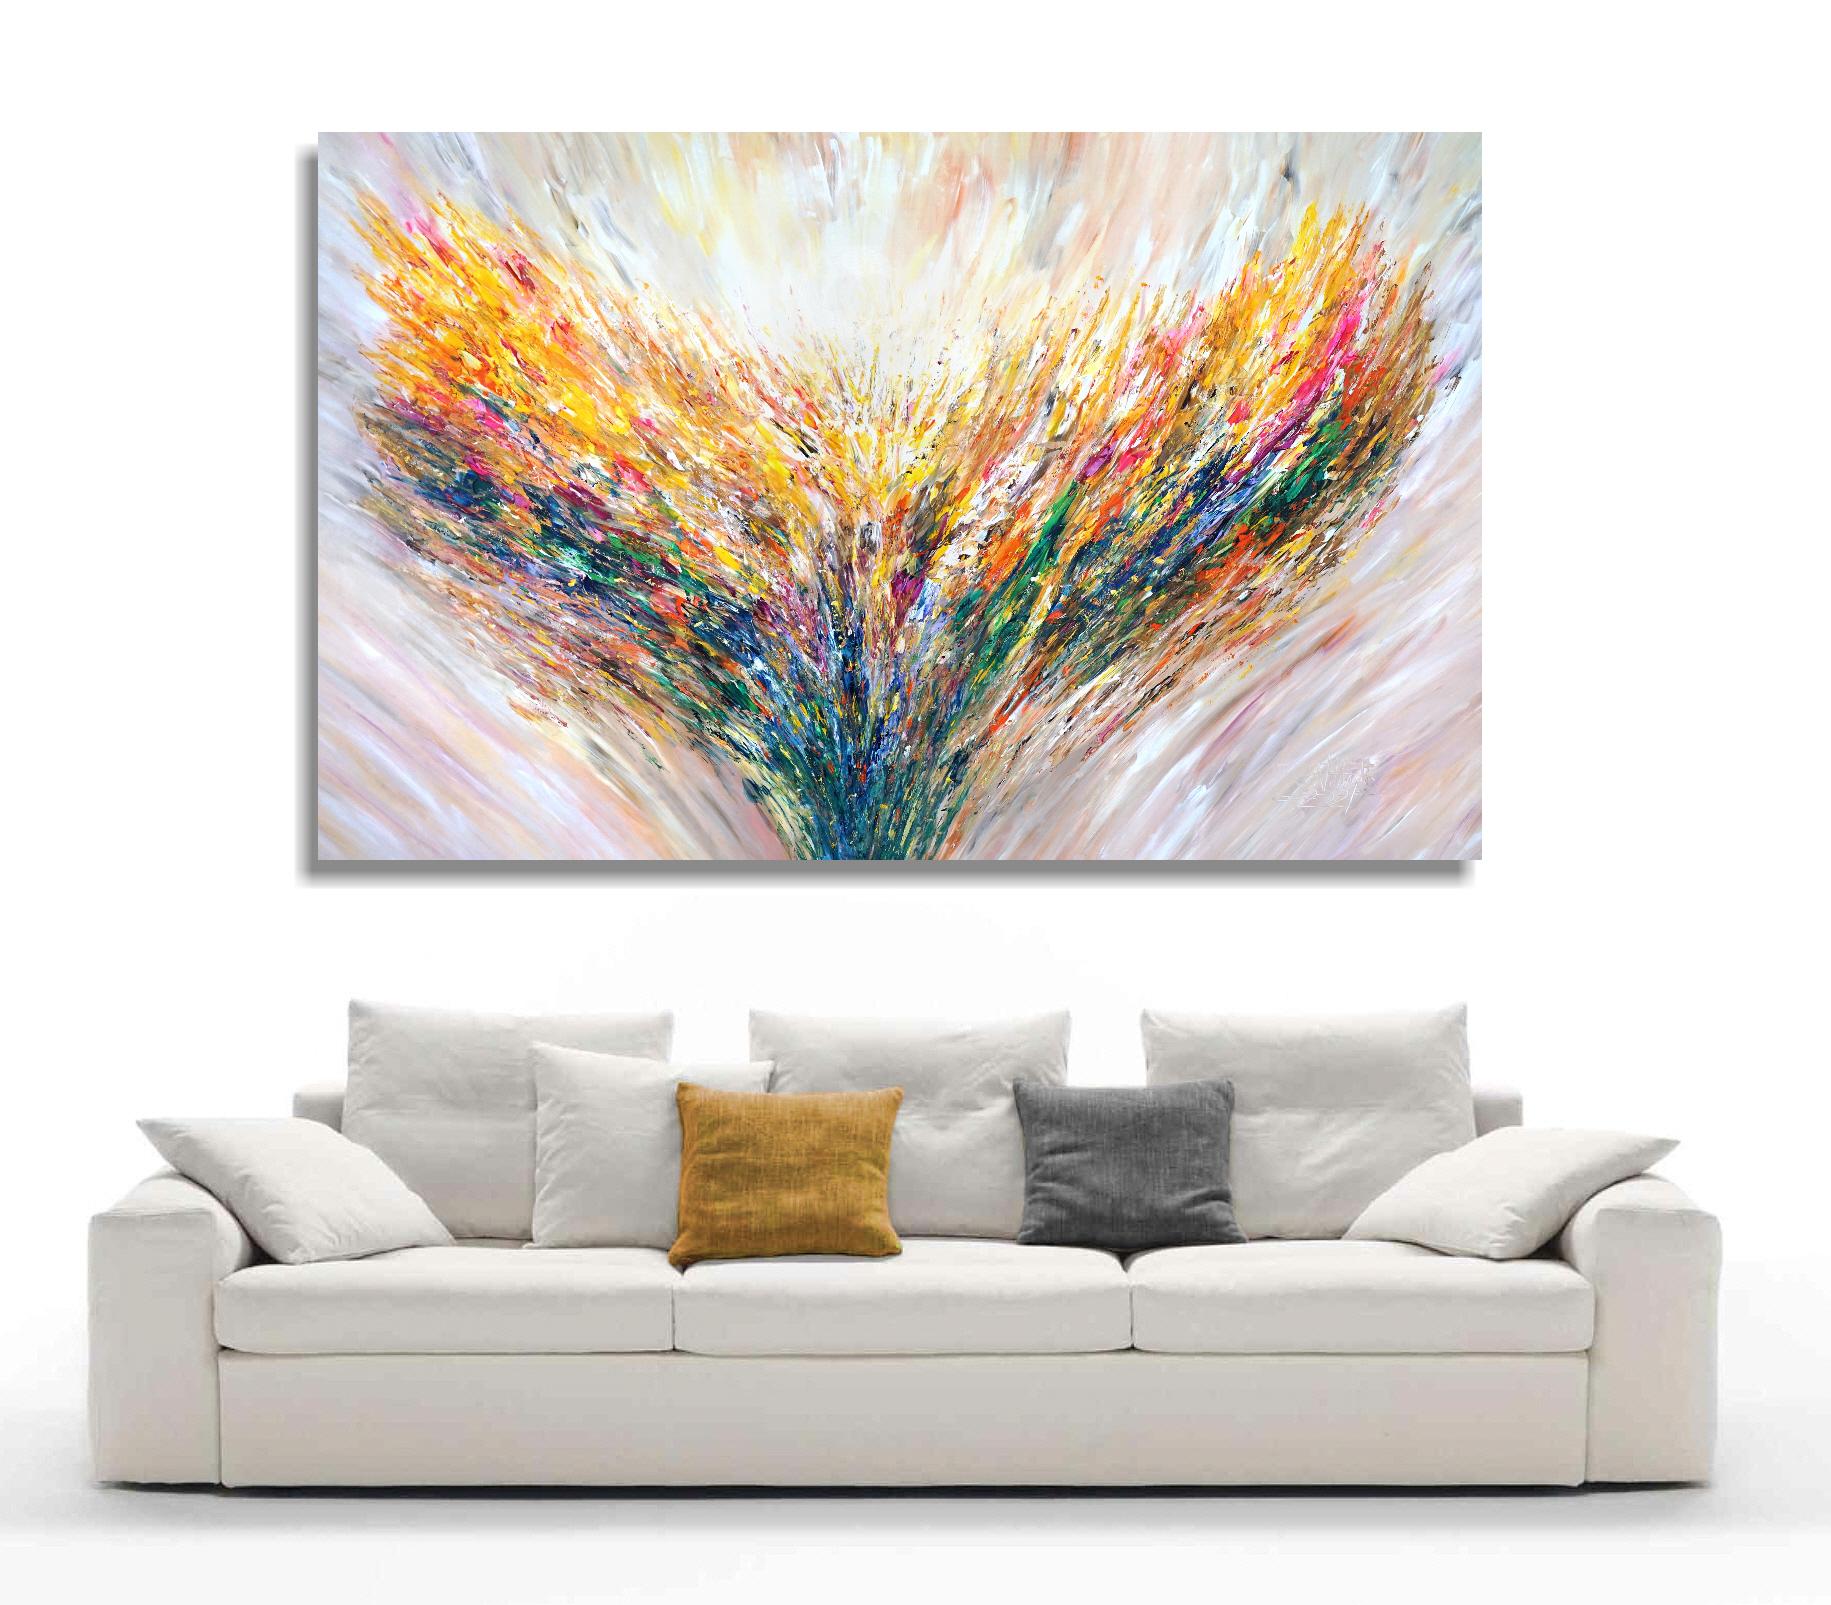 gro e abstrakte gem lde online kaufen grosse abstrakte gemaeldes webseite. Black Bedroom Furniture Sets. Home Design Ideas